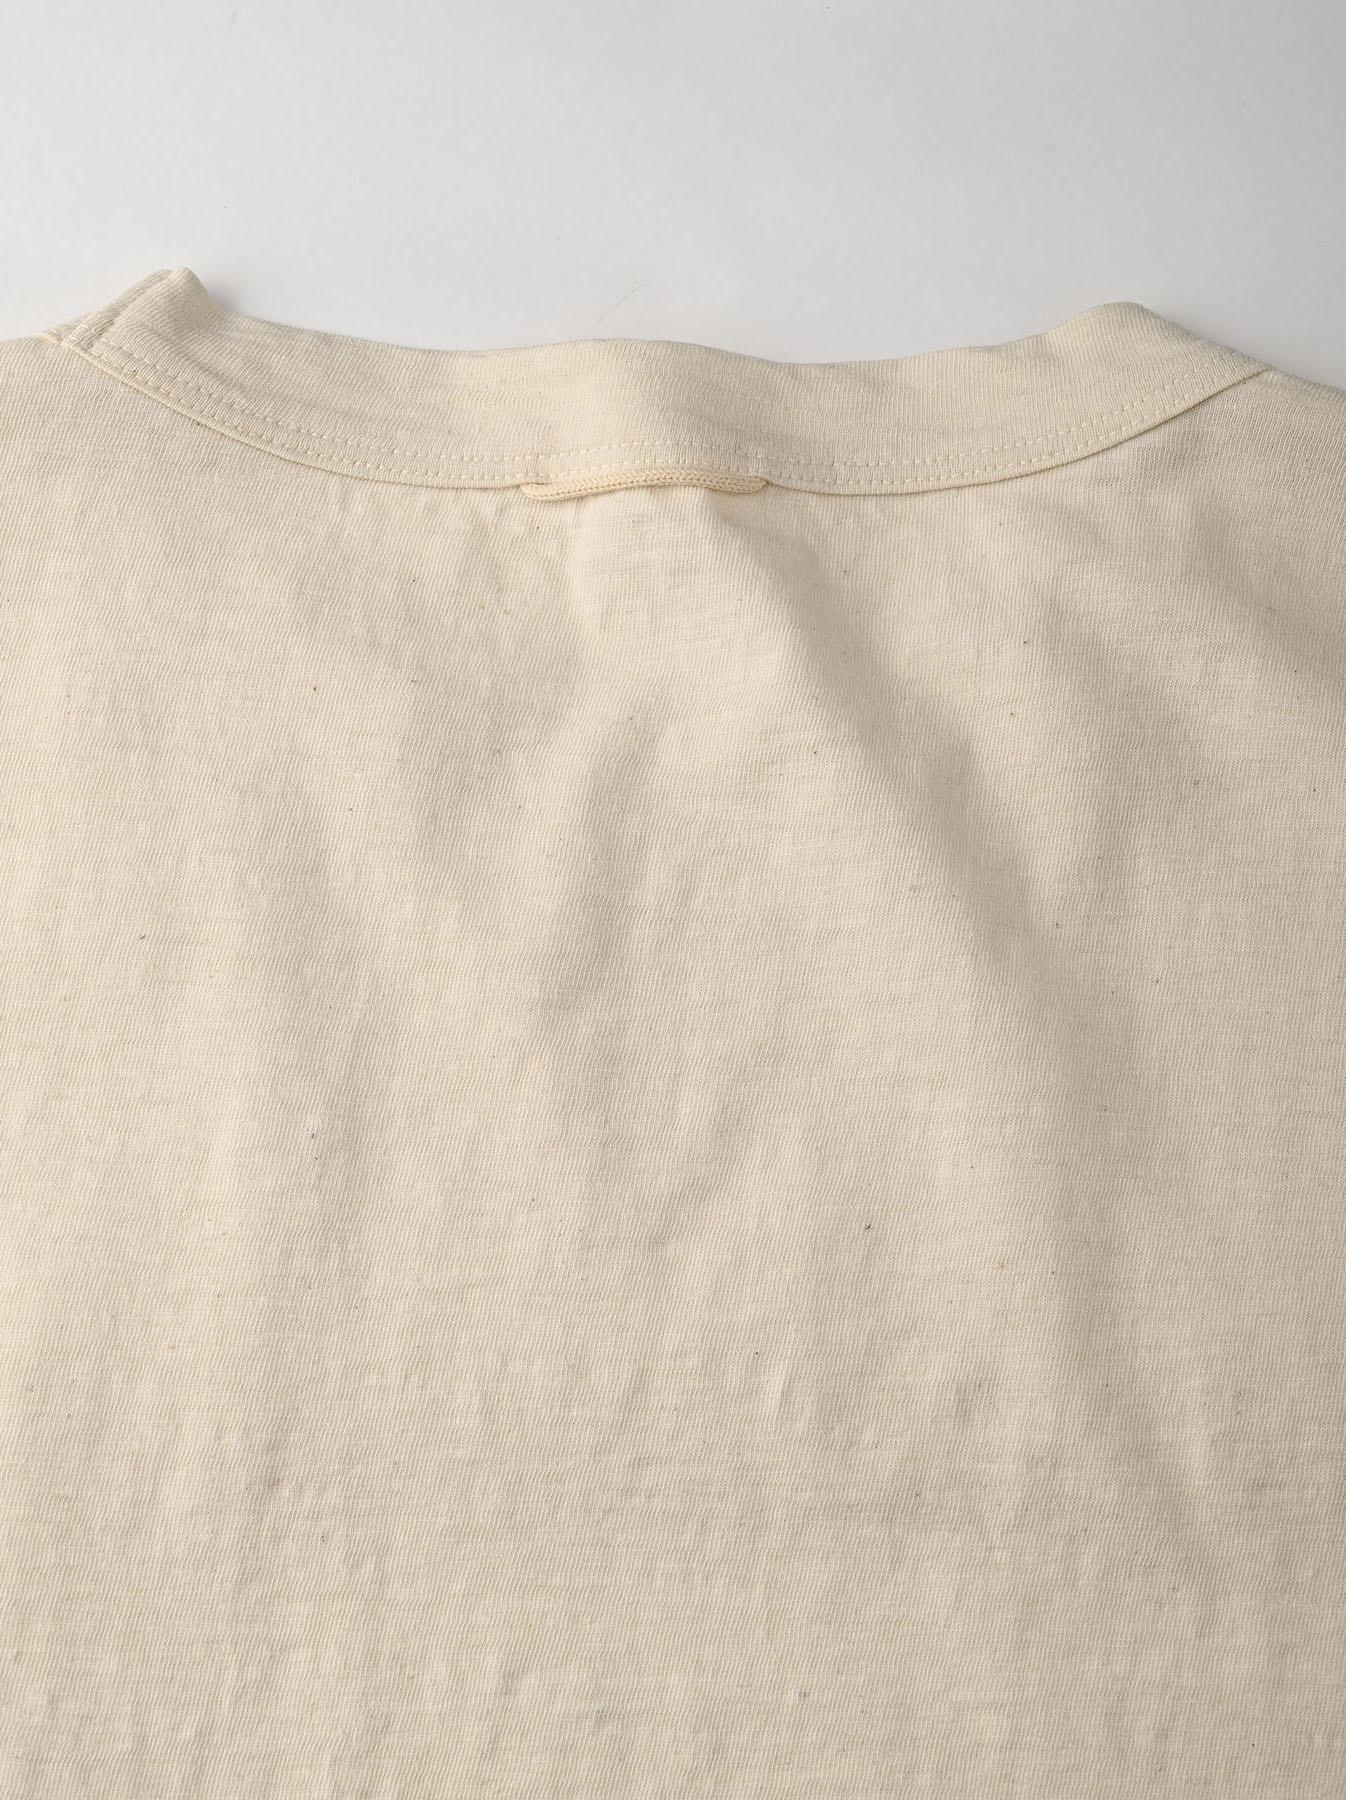 Hayama-kun Embroidered 908 Ocean T-shirt (0621)-10